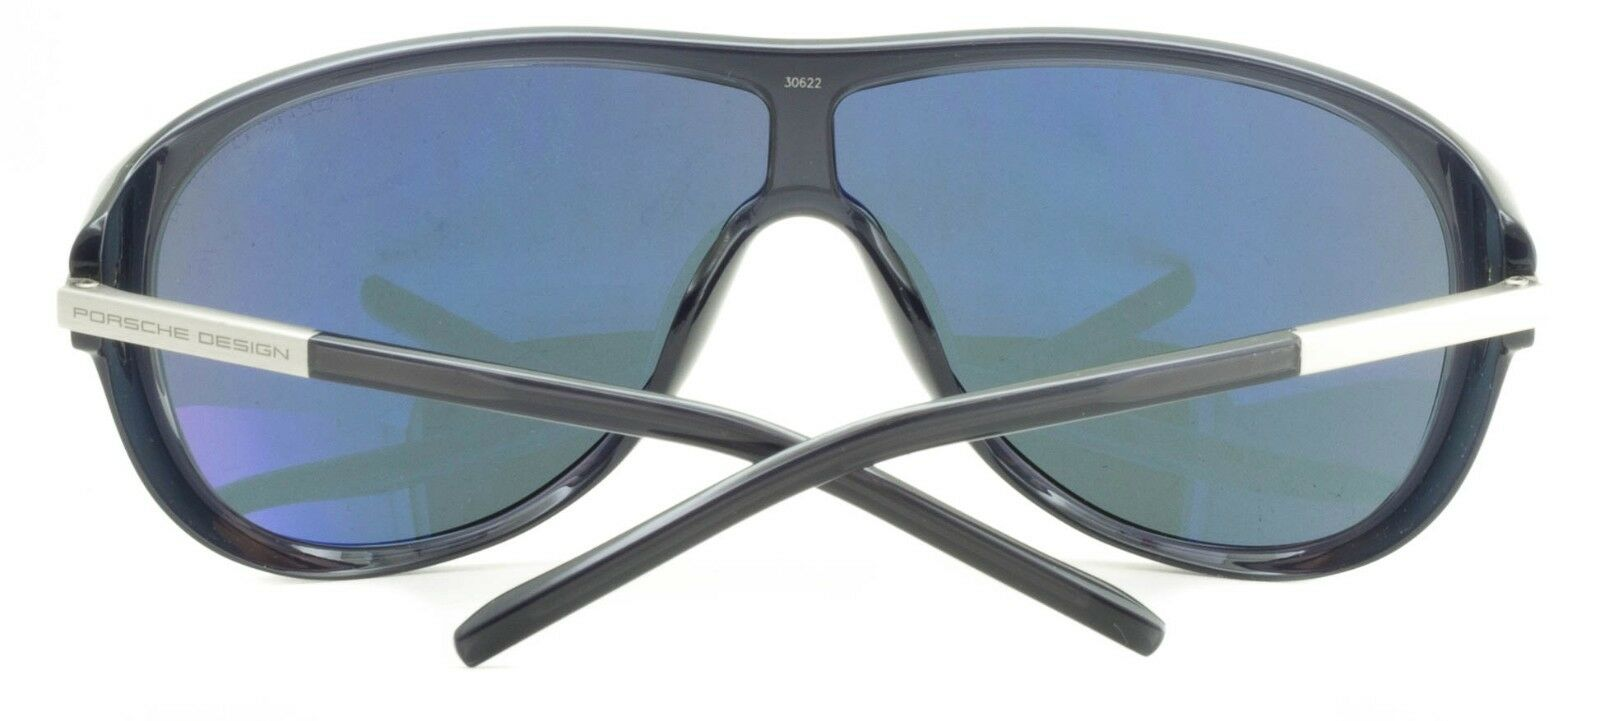 427bc16dacf5 Porsche Design Oversized Shield Sunglasses UV Protection Mirrored Lenses  for sale online